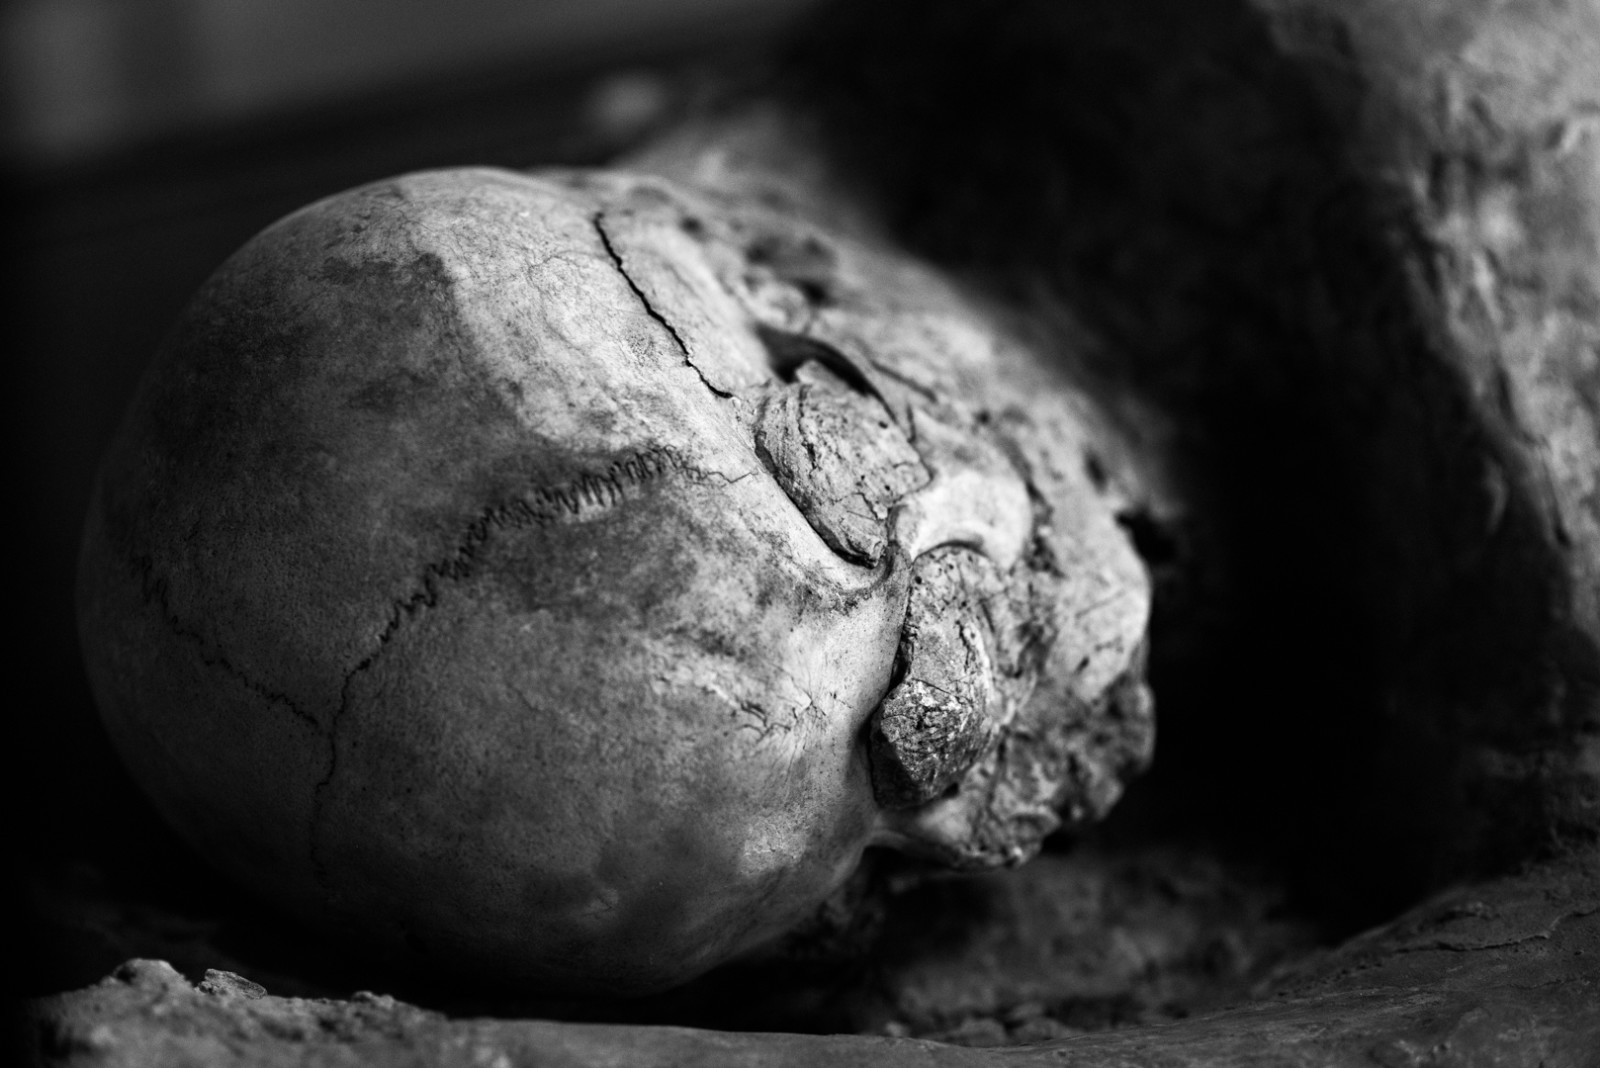 pompeii-7,xlarge.1507130022